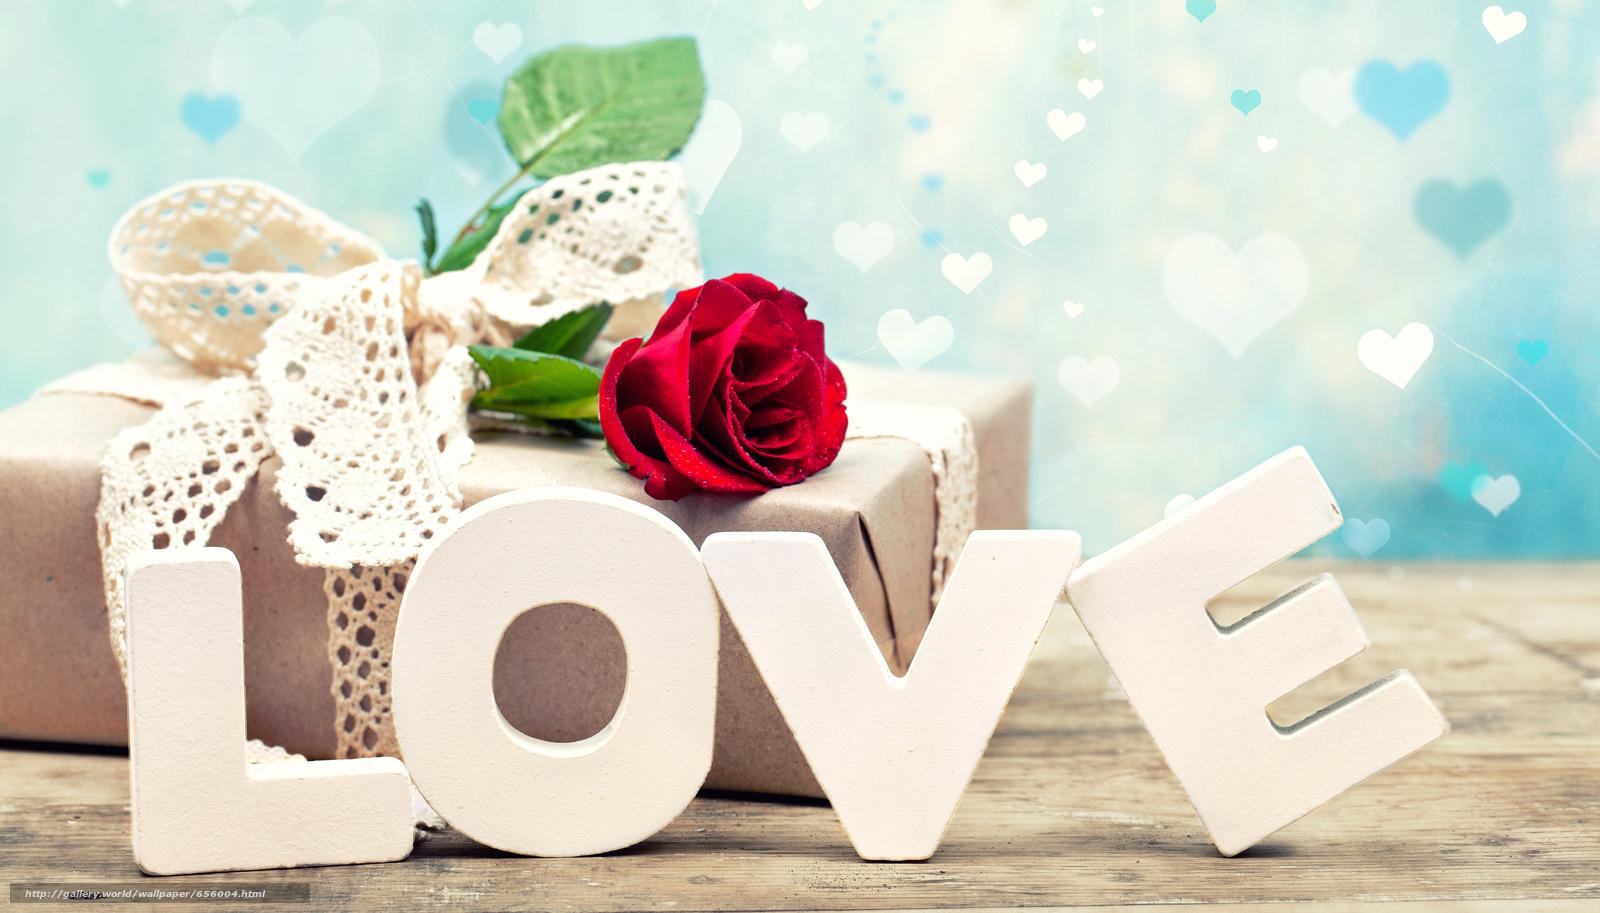 Tlcharger Fond D Ecran Valentin Rose Cadeau Aimer Fonds